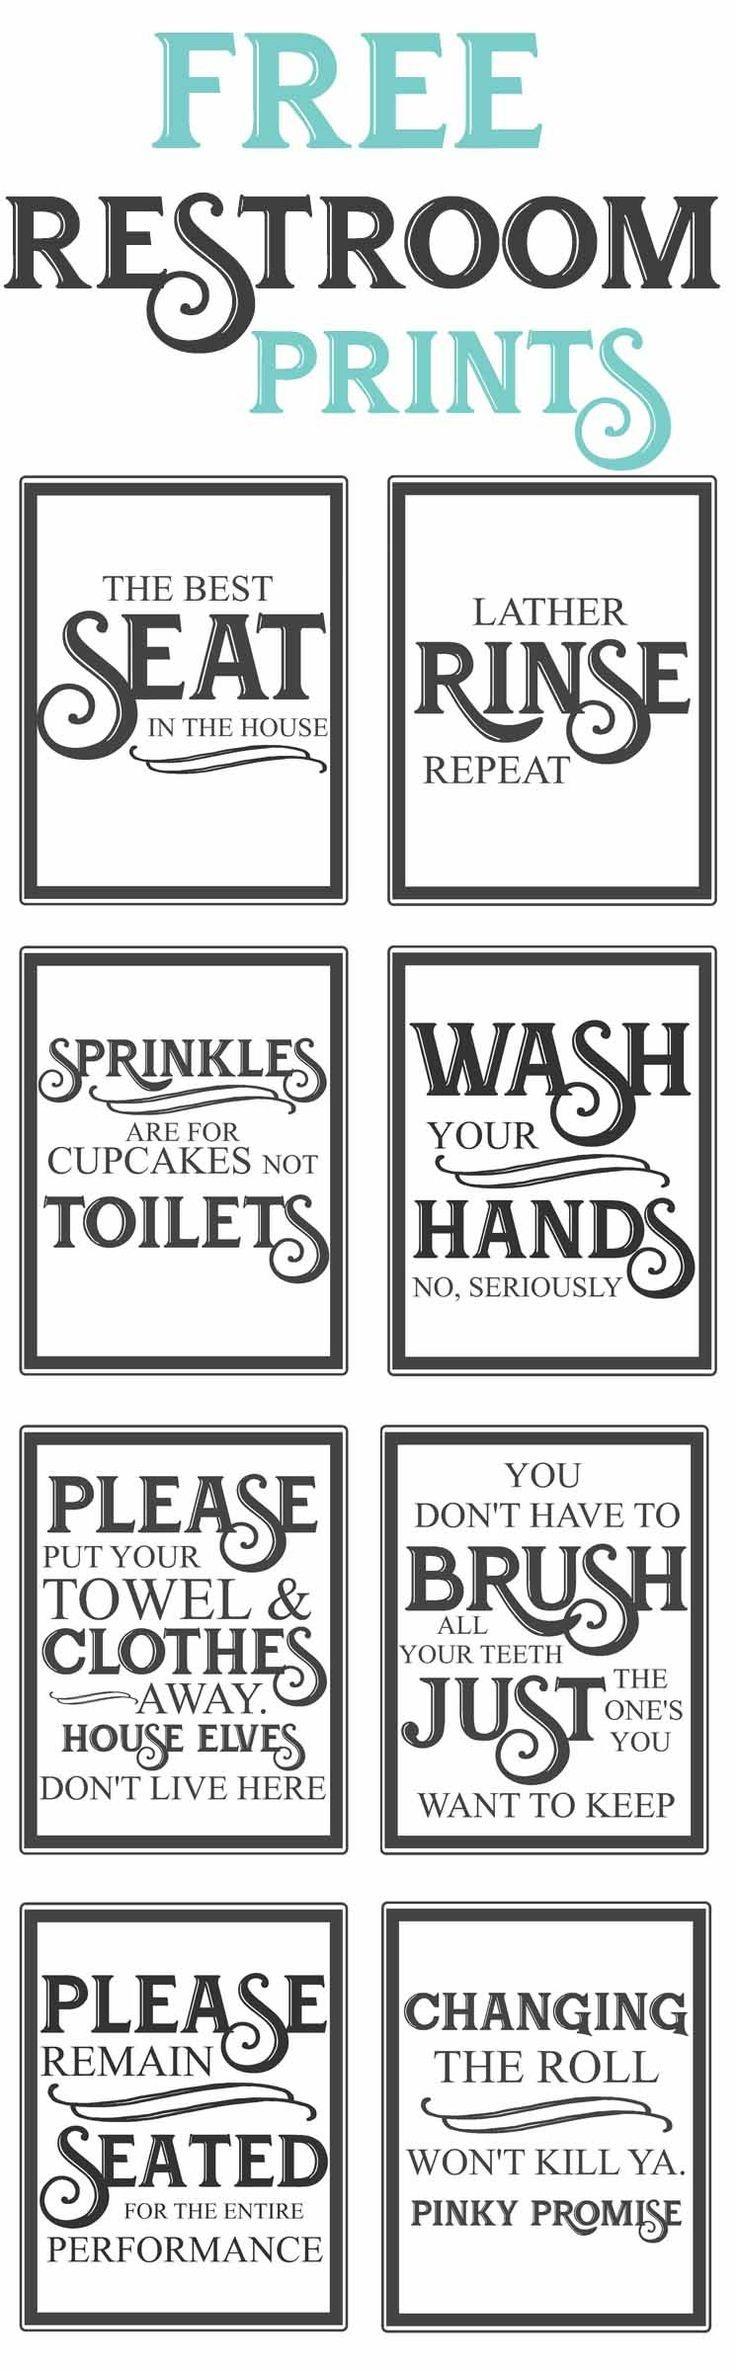 Free Vintage Bathroom Printables   Farmhouse   Diy Home Decor, Home - Free Printable Bathroom Quotes